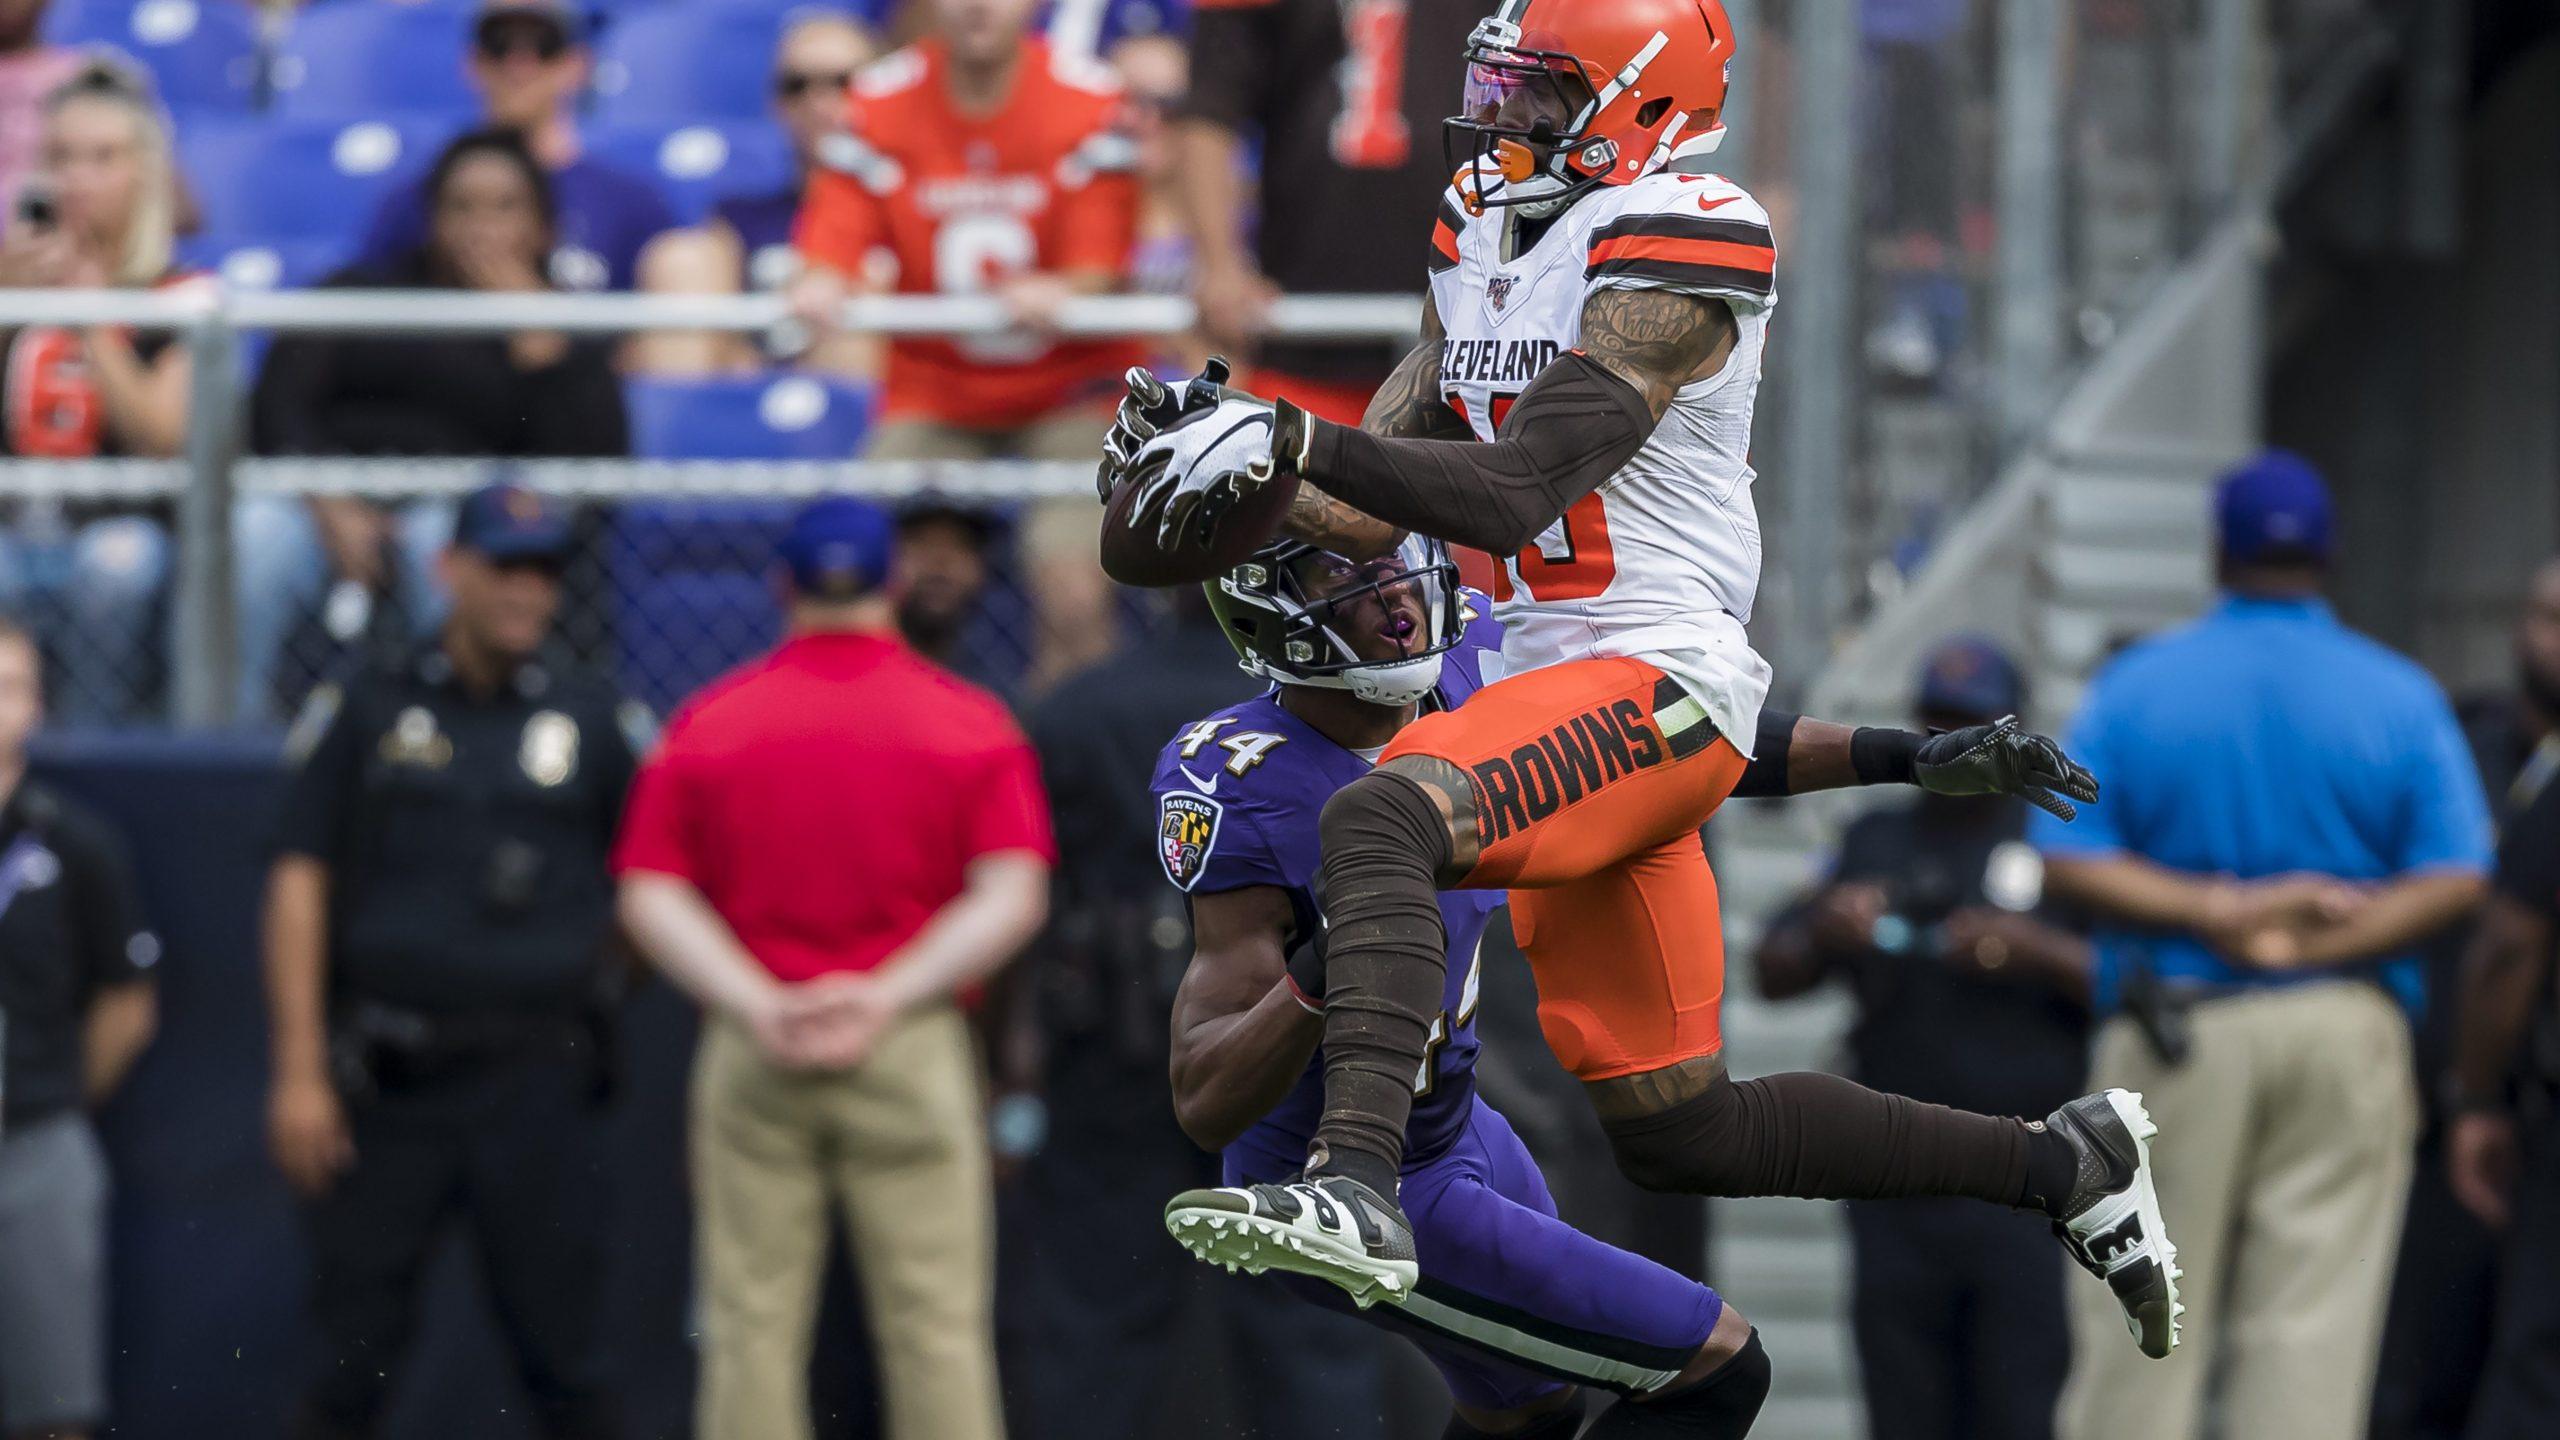 Browns Wr Odell Beckham Jr Fined 14k For Fight With Ravens